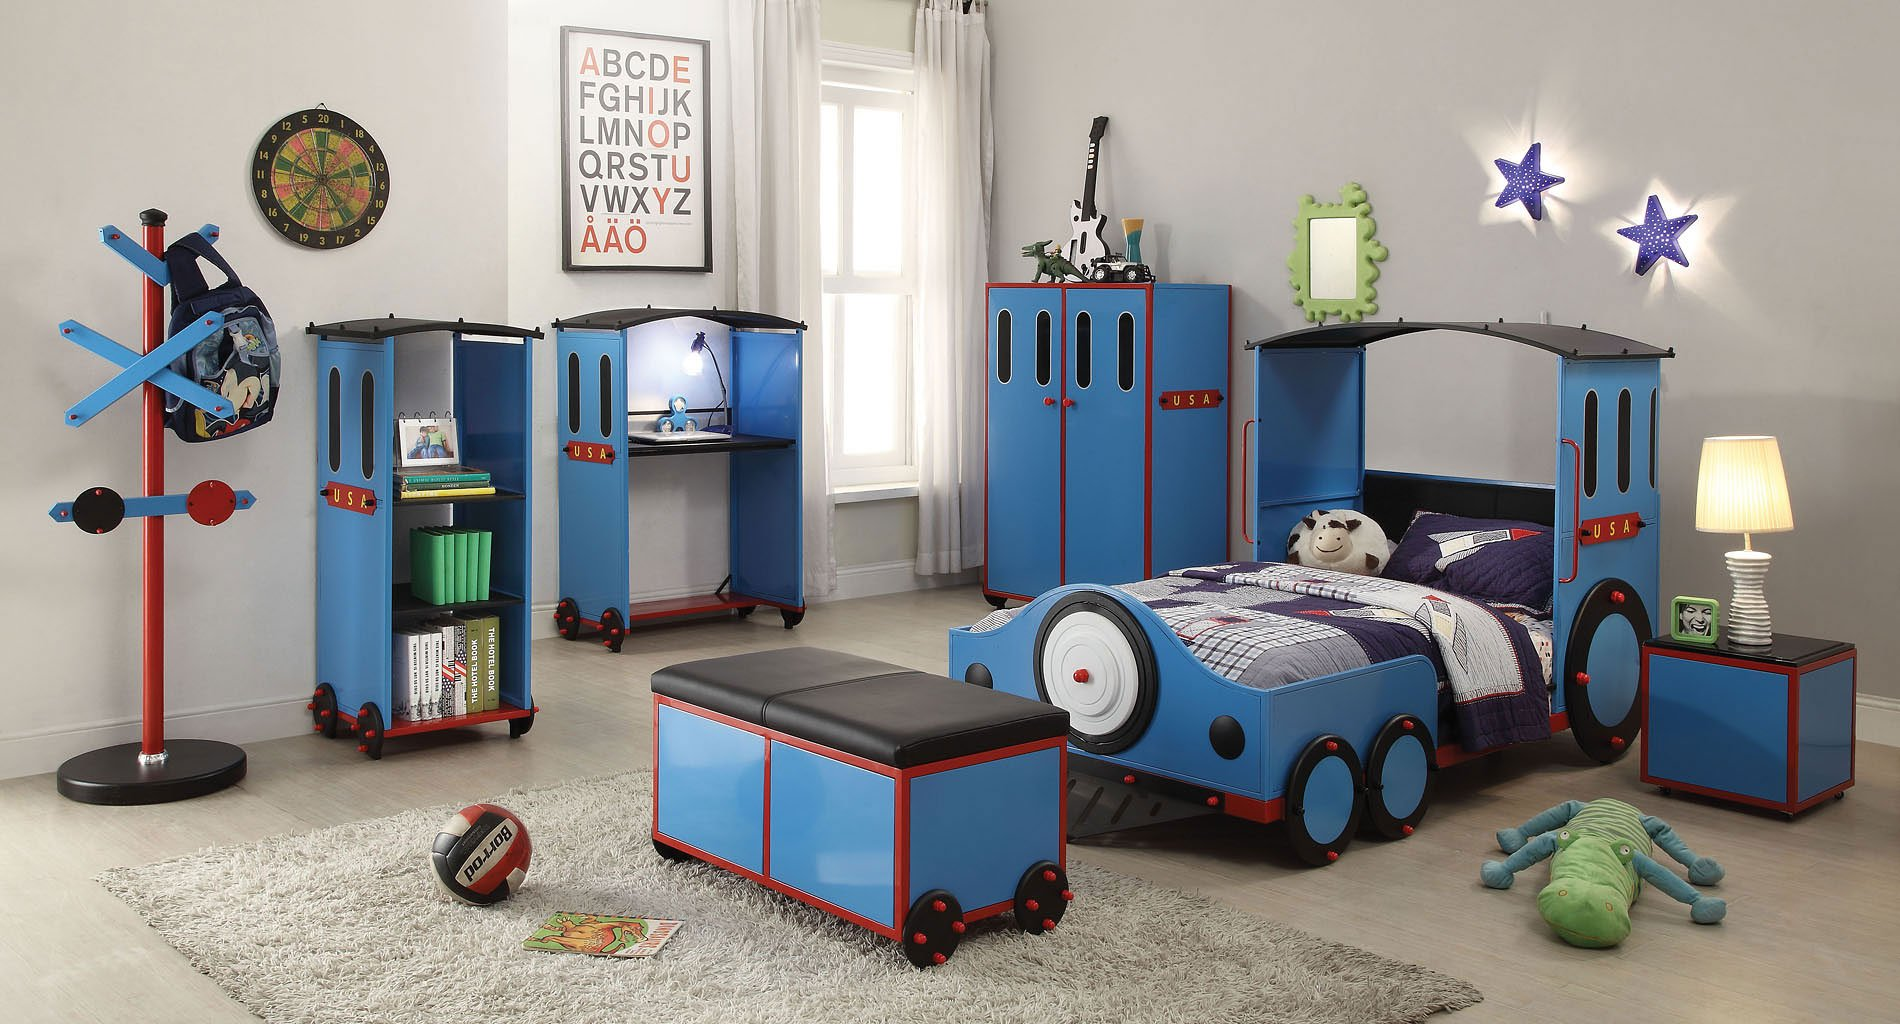 Tobi Train Bedroom Set